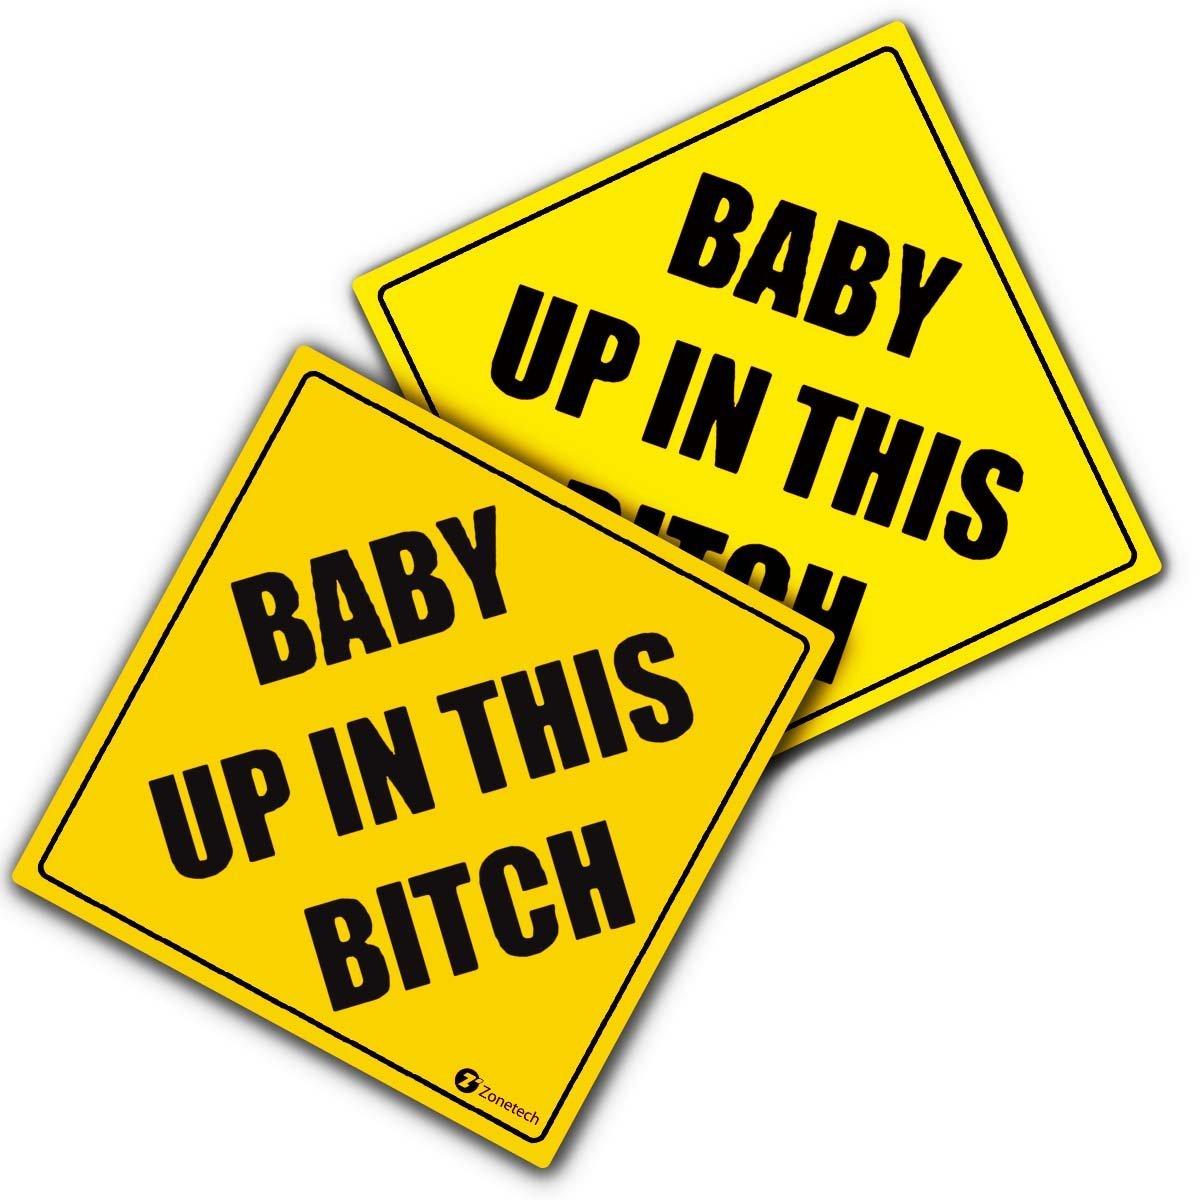 "Zone Tech ""Baby Up In This Bitch"" Vehicle Safety Sticker - 2-Pack Premium Quality Convenient Reflective ""Baby Up On This Bitch"" Vehicle Safety Funny Sign Sticker"